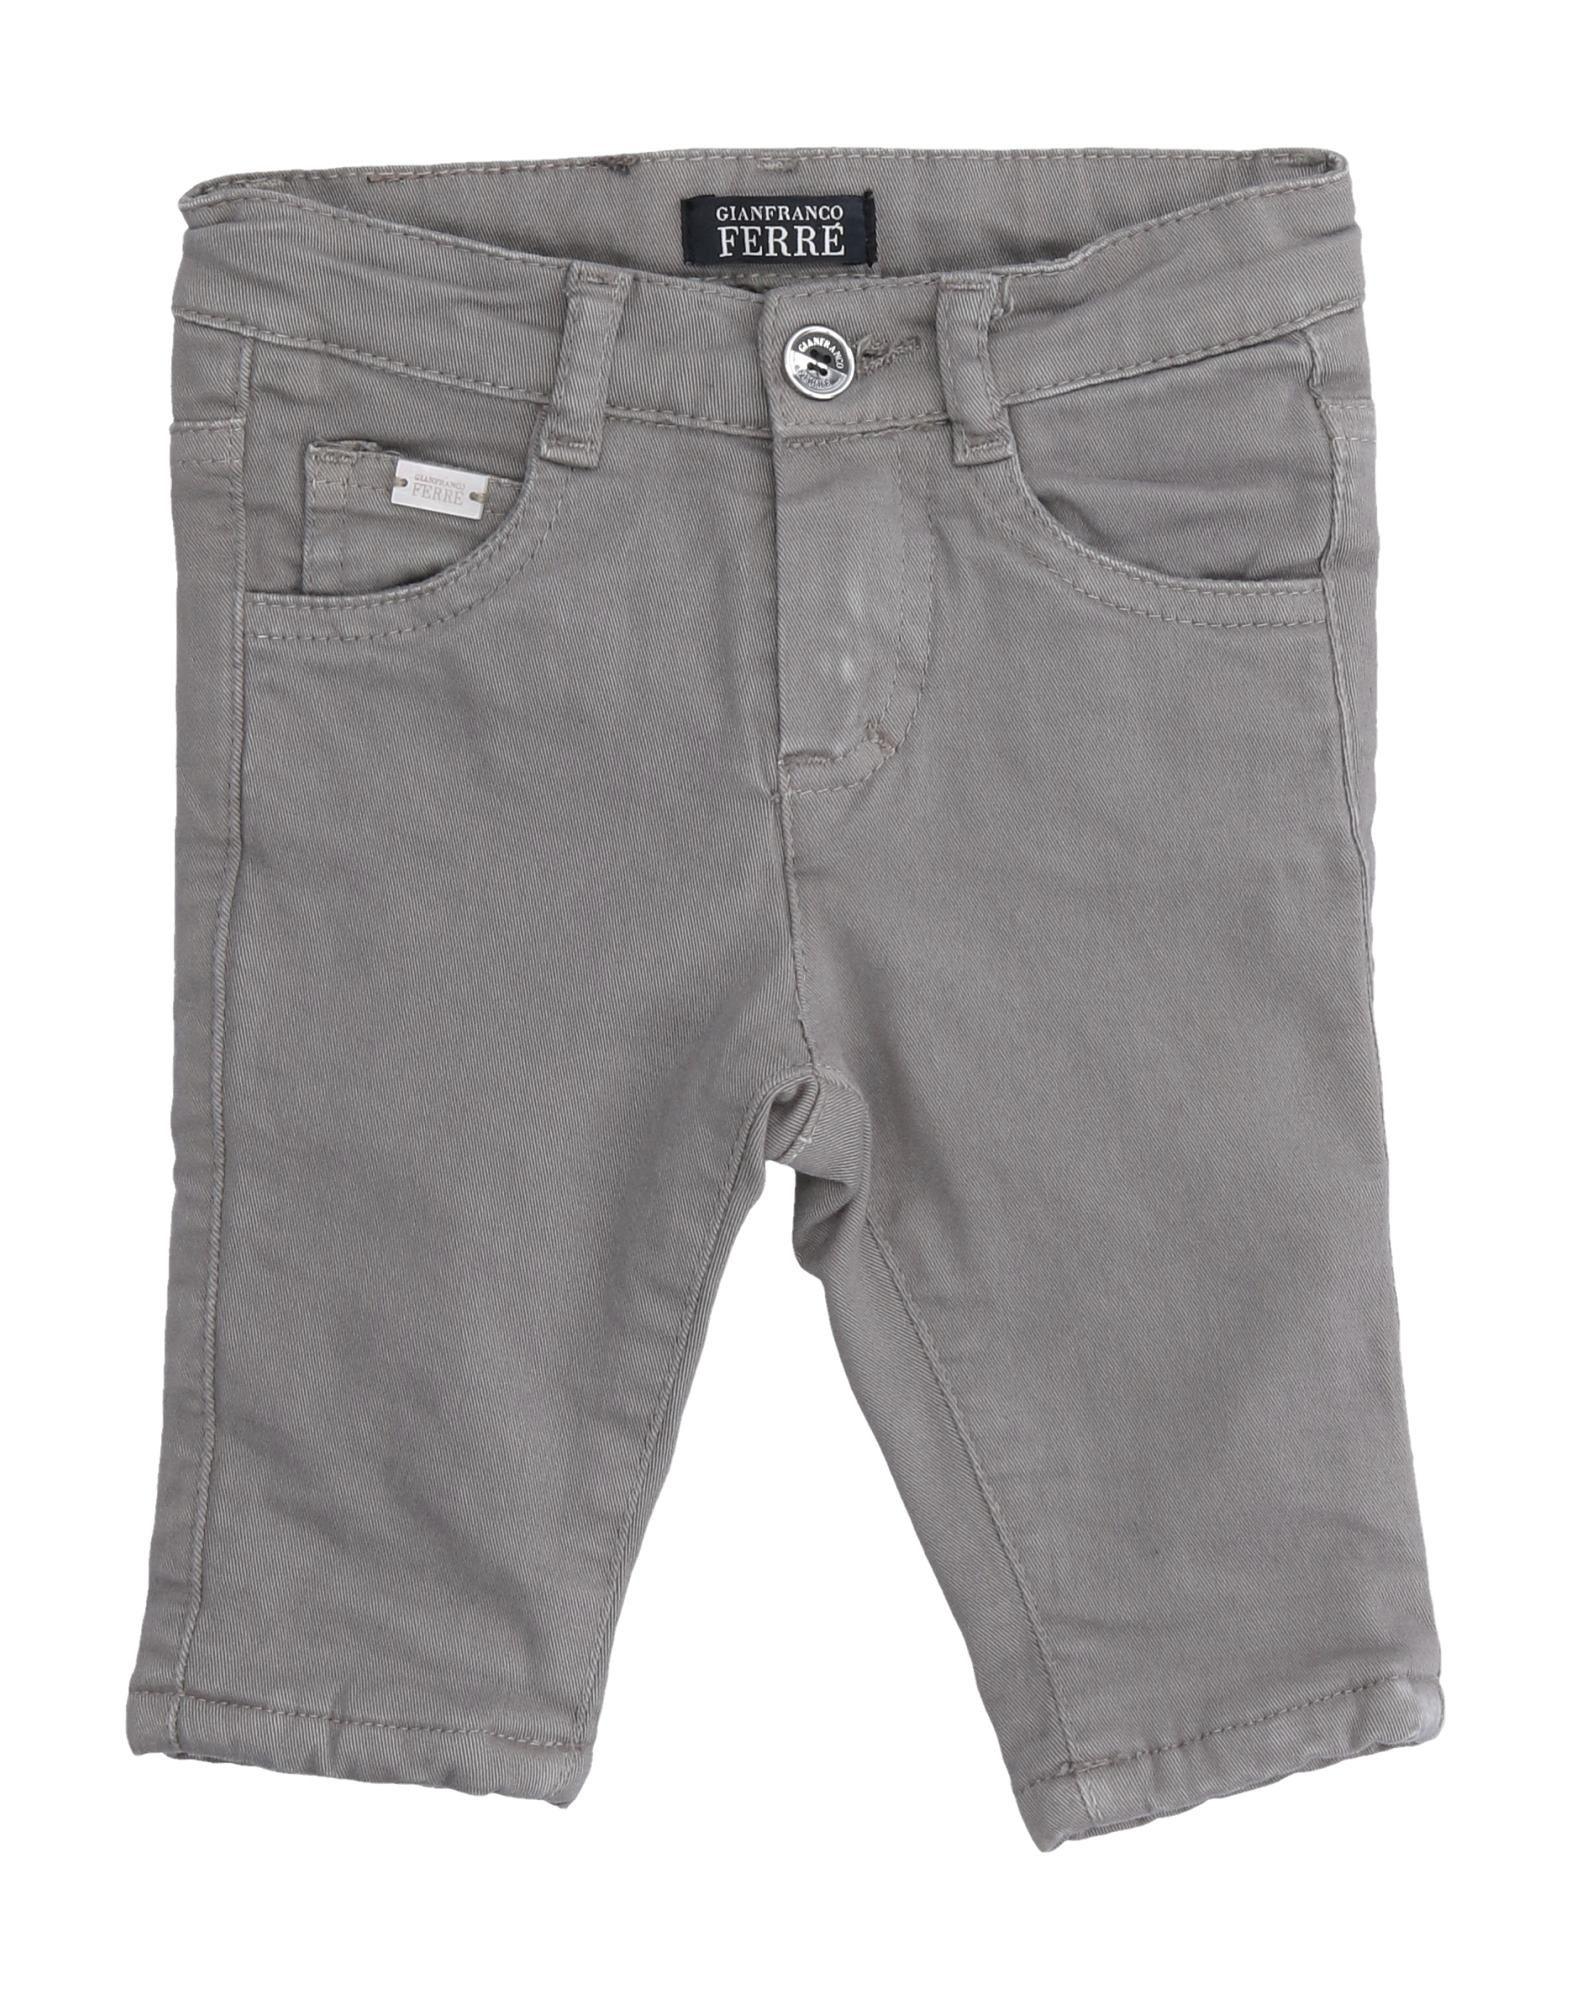 Gianfranco Ferre Kids' Casual Pants In Gray